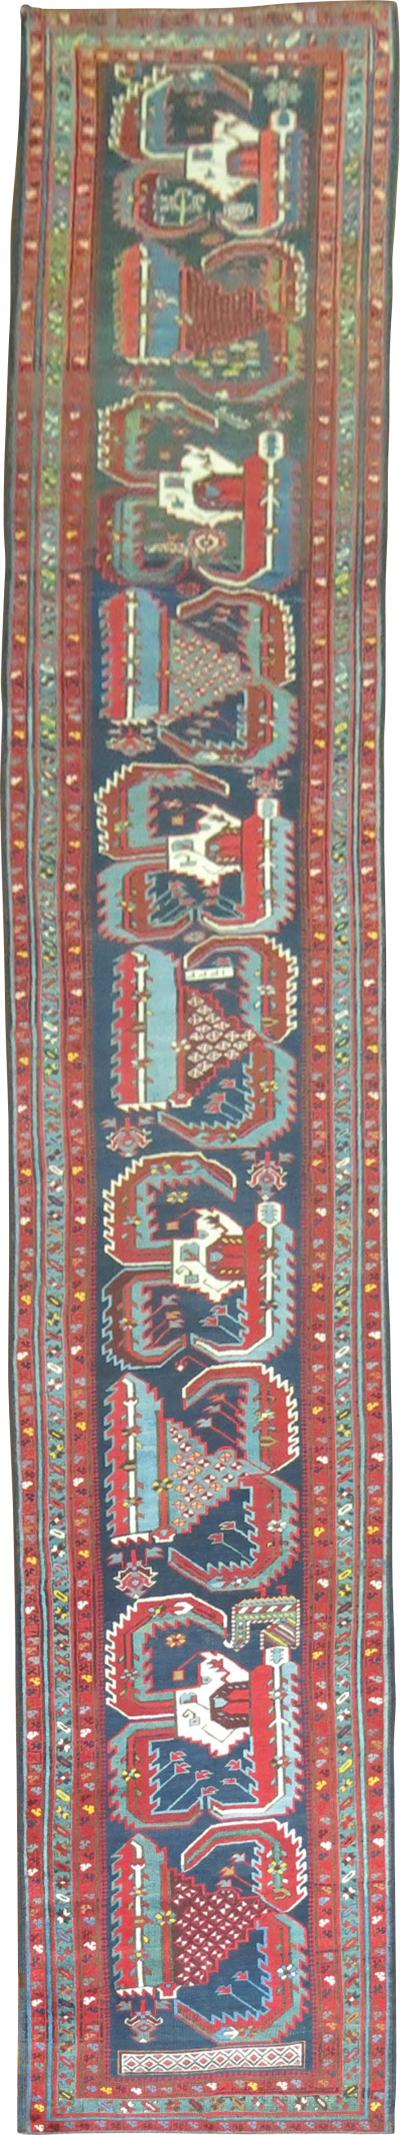 Rare Antique Talish Runner rug no 8864